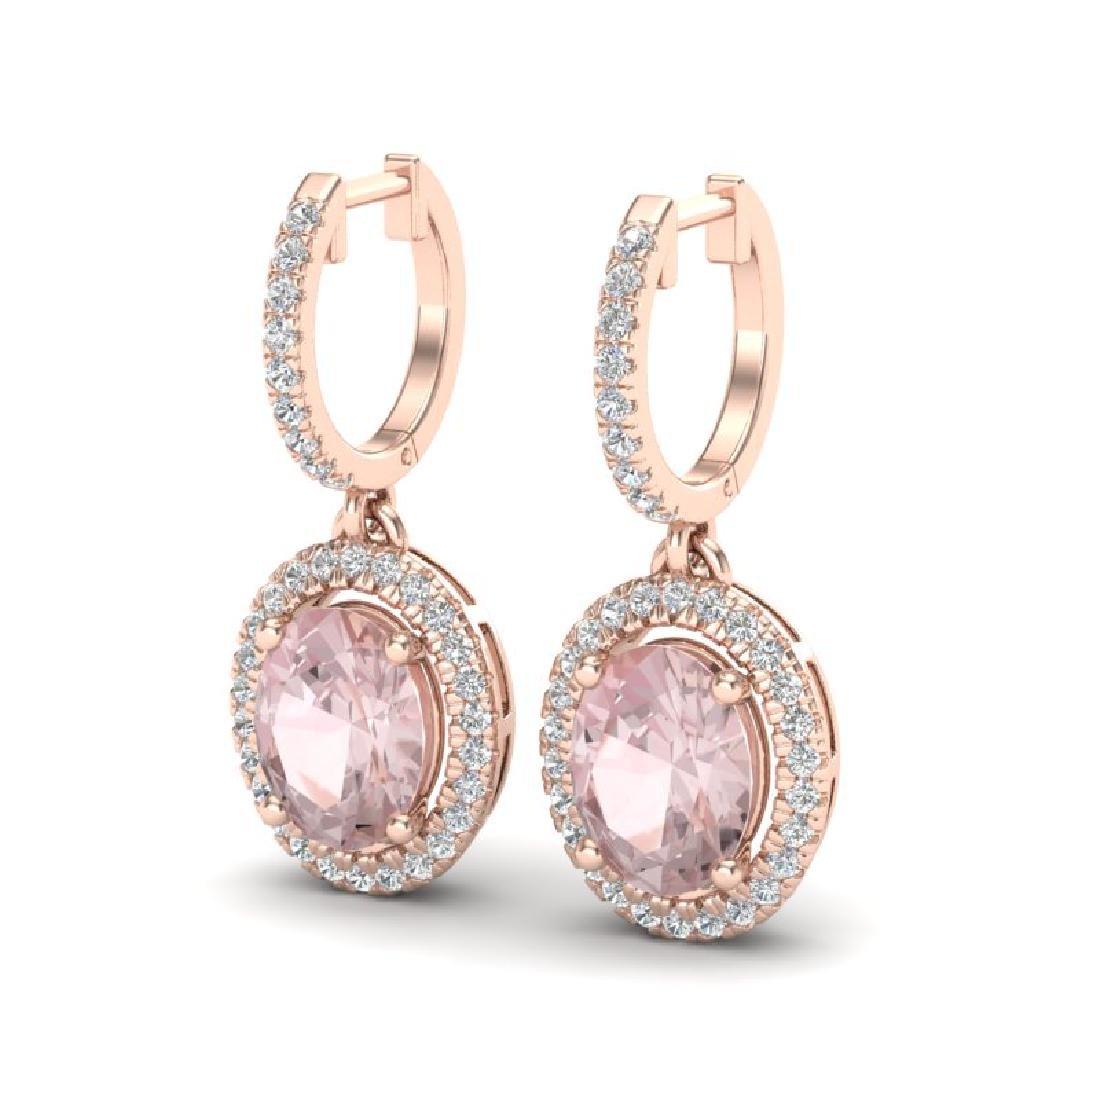 3.25 CTW Morganite & Micro Pave VS/SI Diamond Earrings